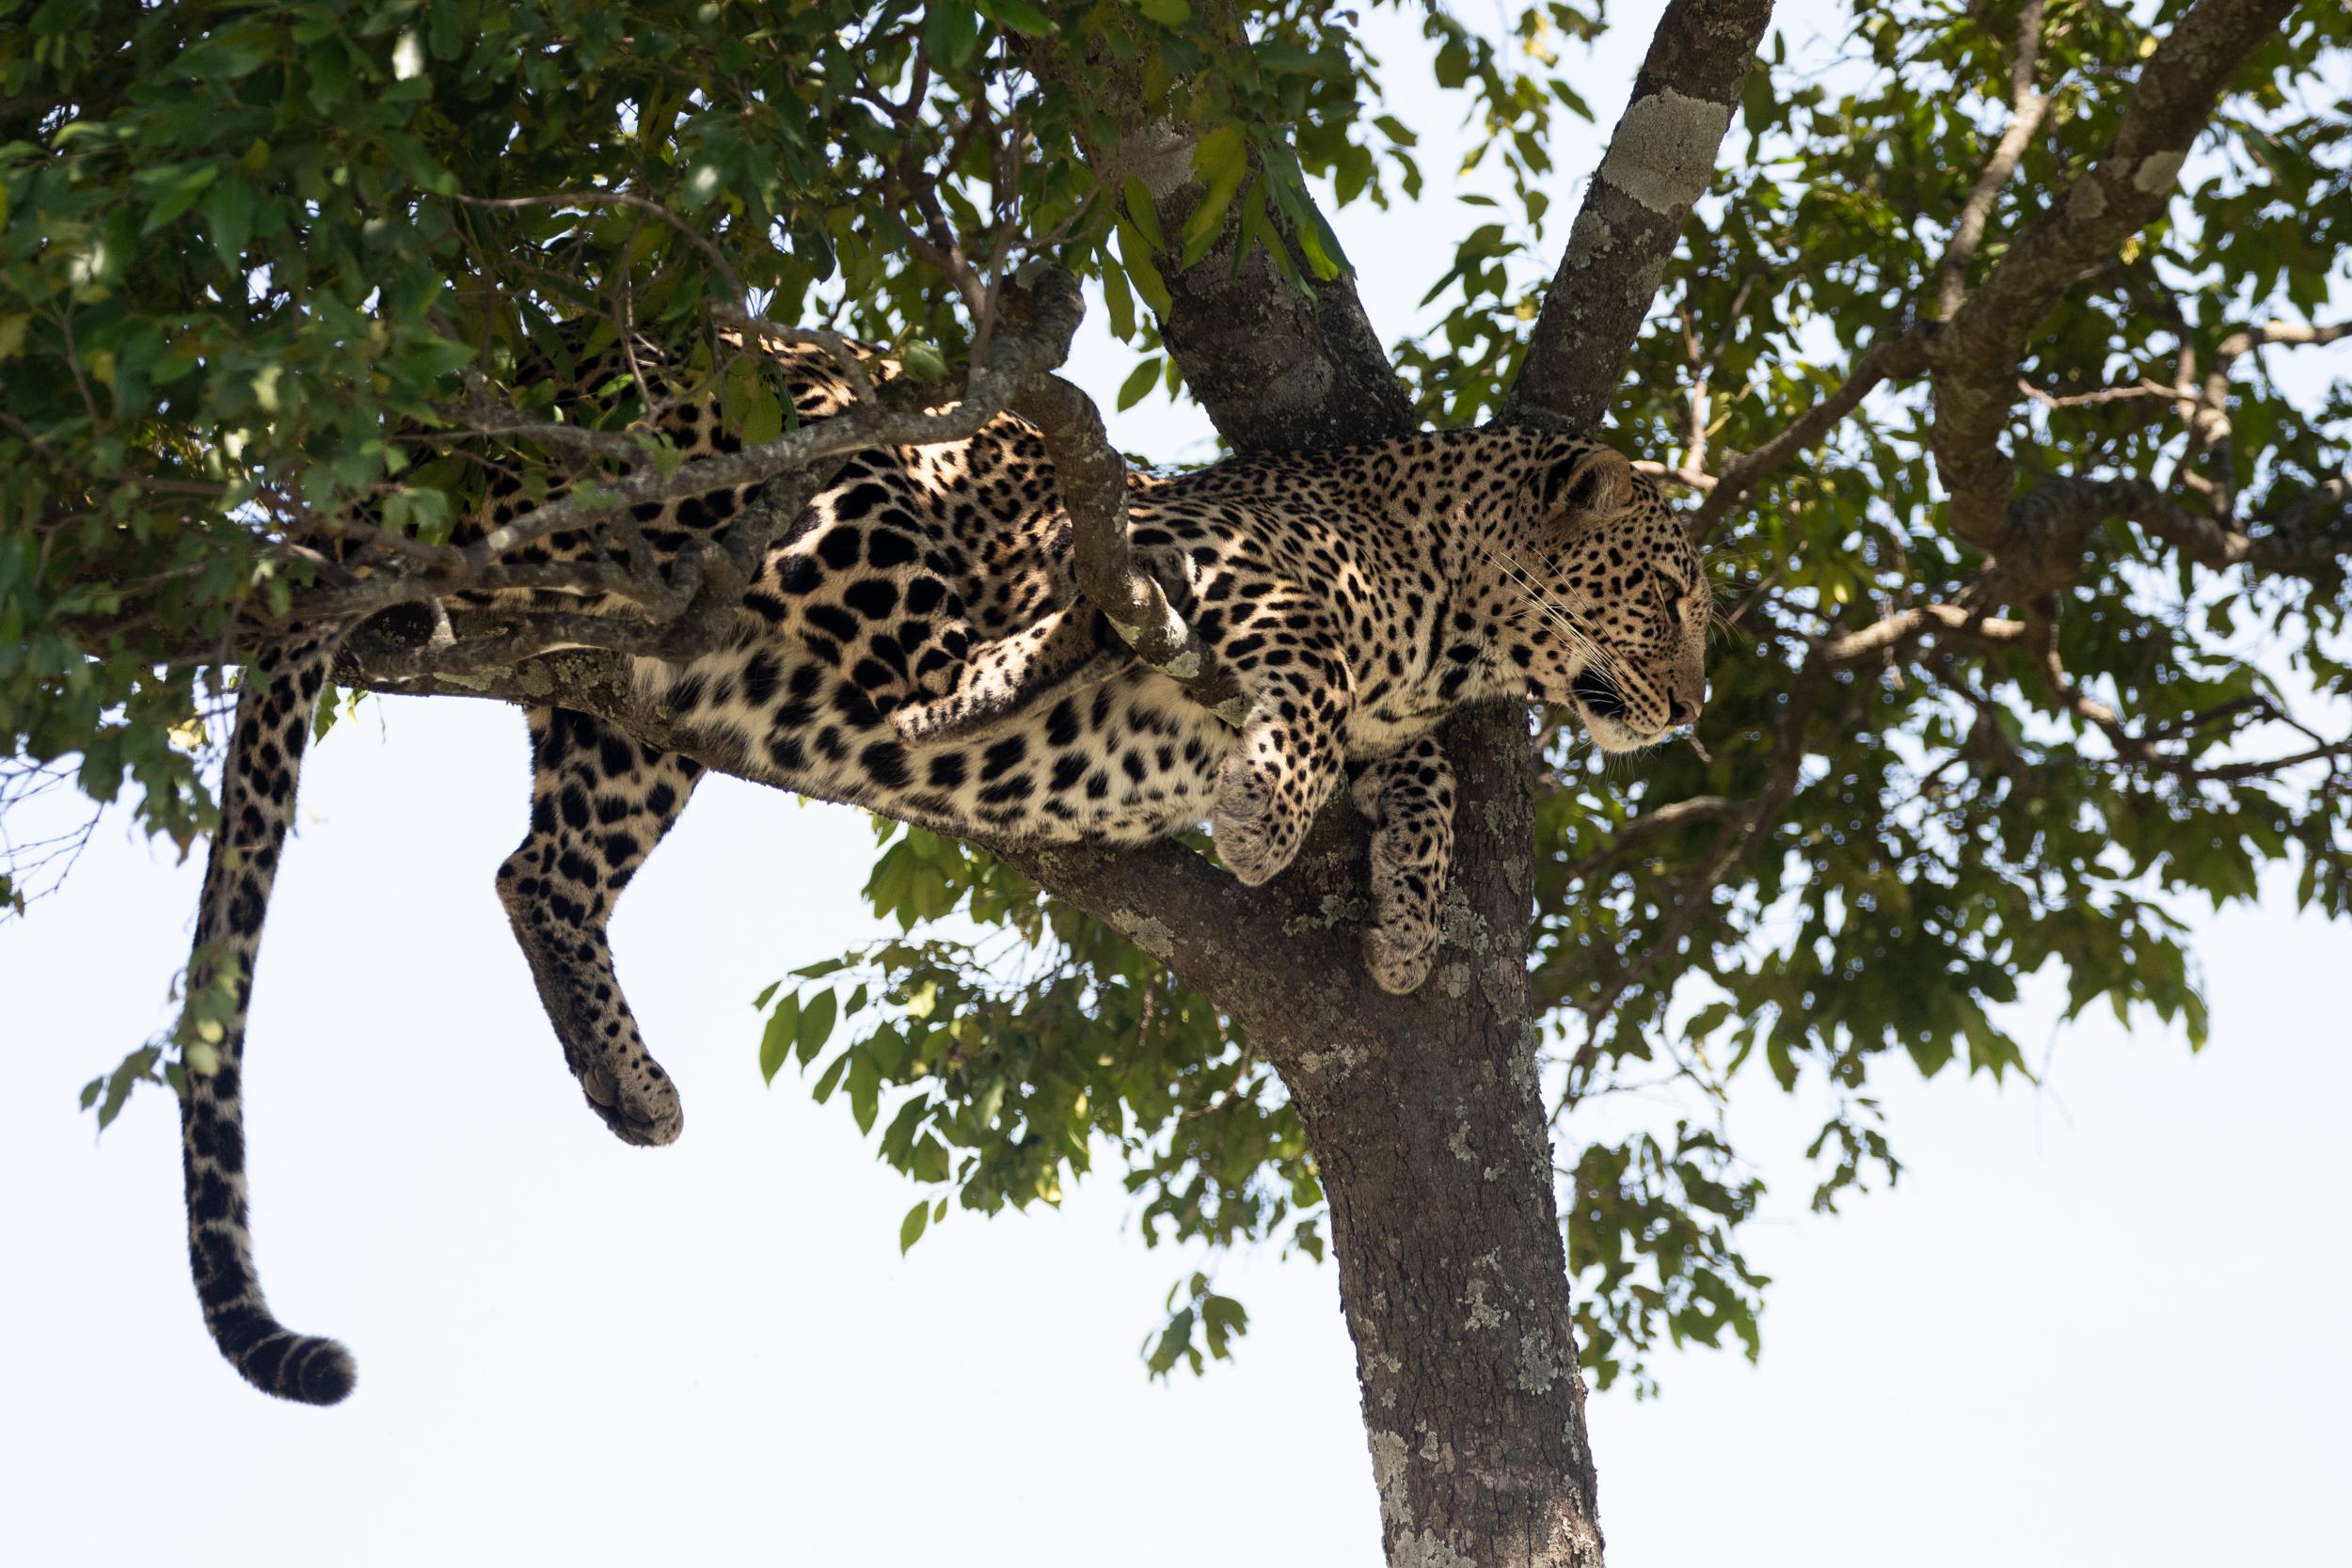 A leopard sits in a tree in Maasai Mara National Park. September 2018 - Maasai Mara, Kenya.